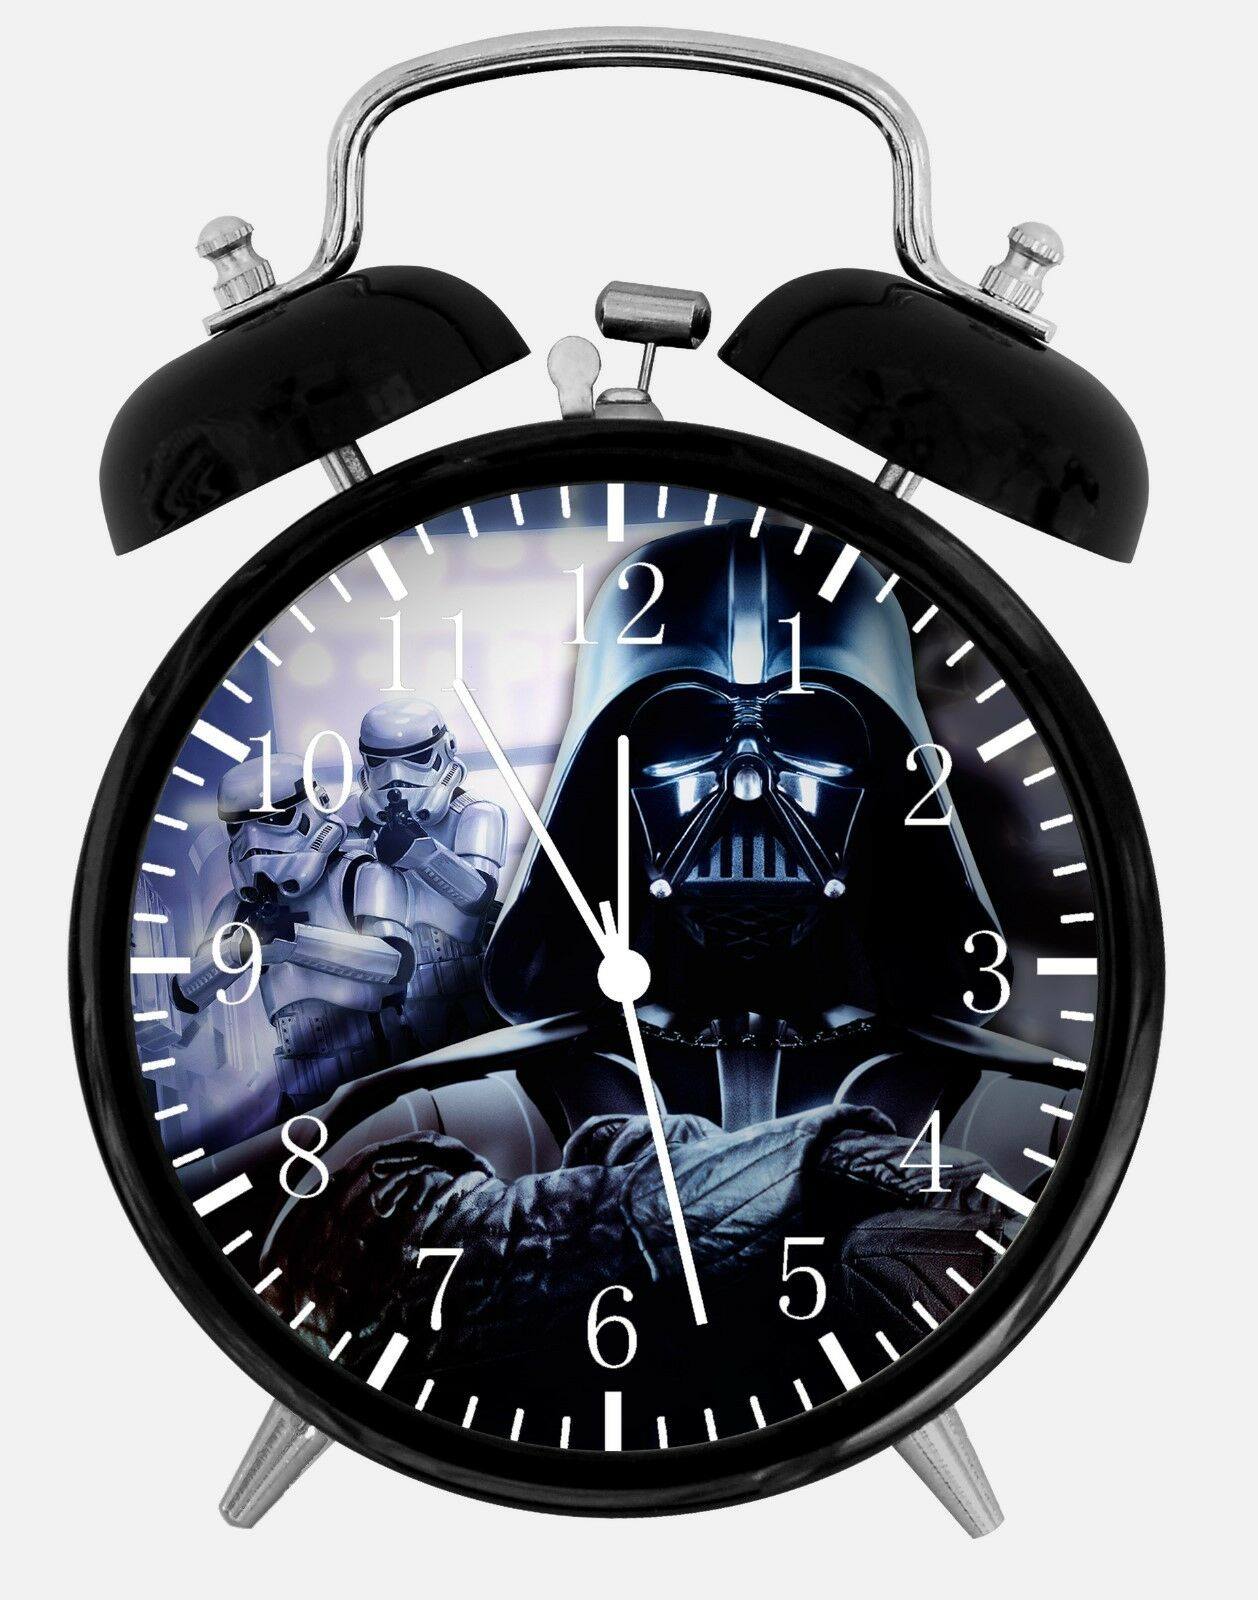 "Star Wars Darth Vader Alarm Desk Clock 3.75"" Home or Office Decor E448"